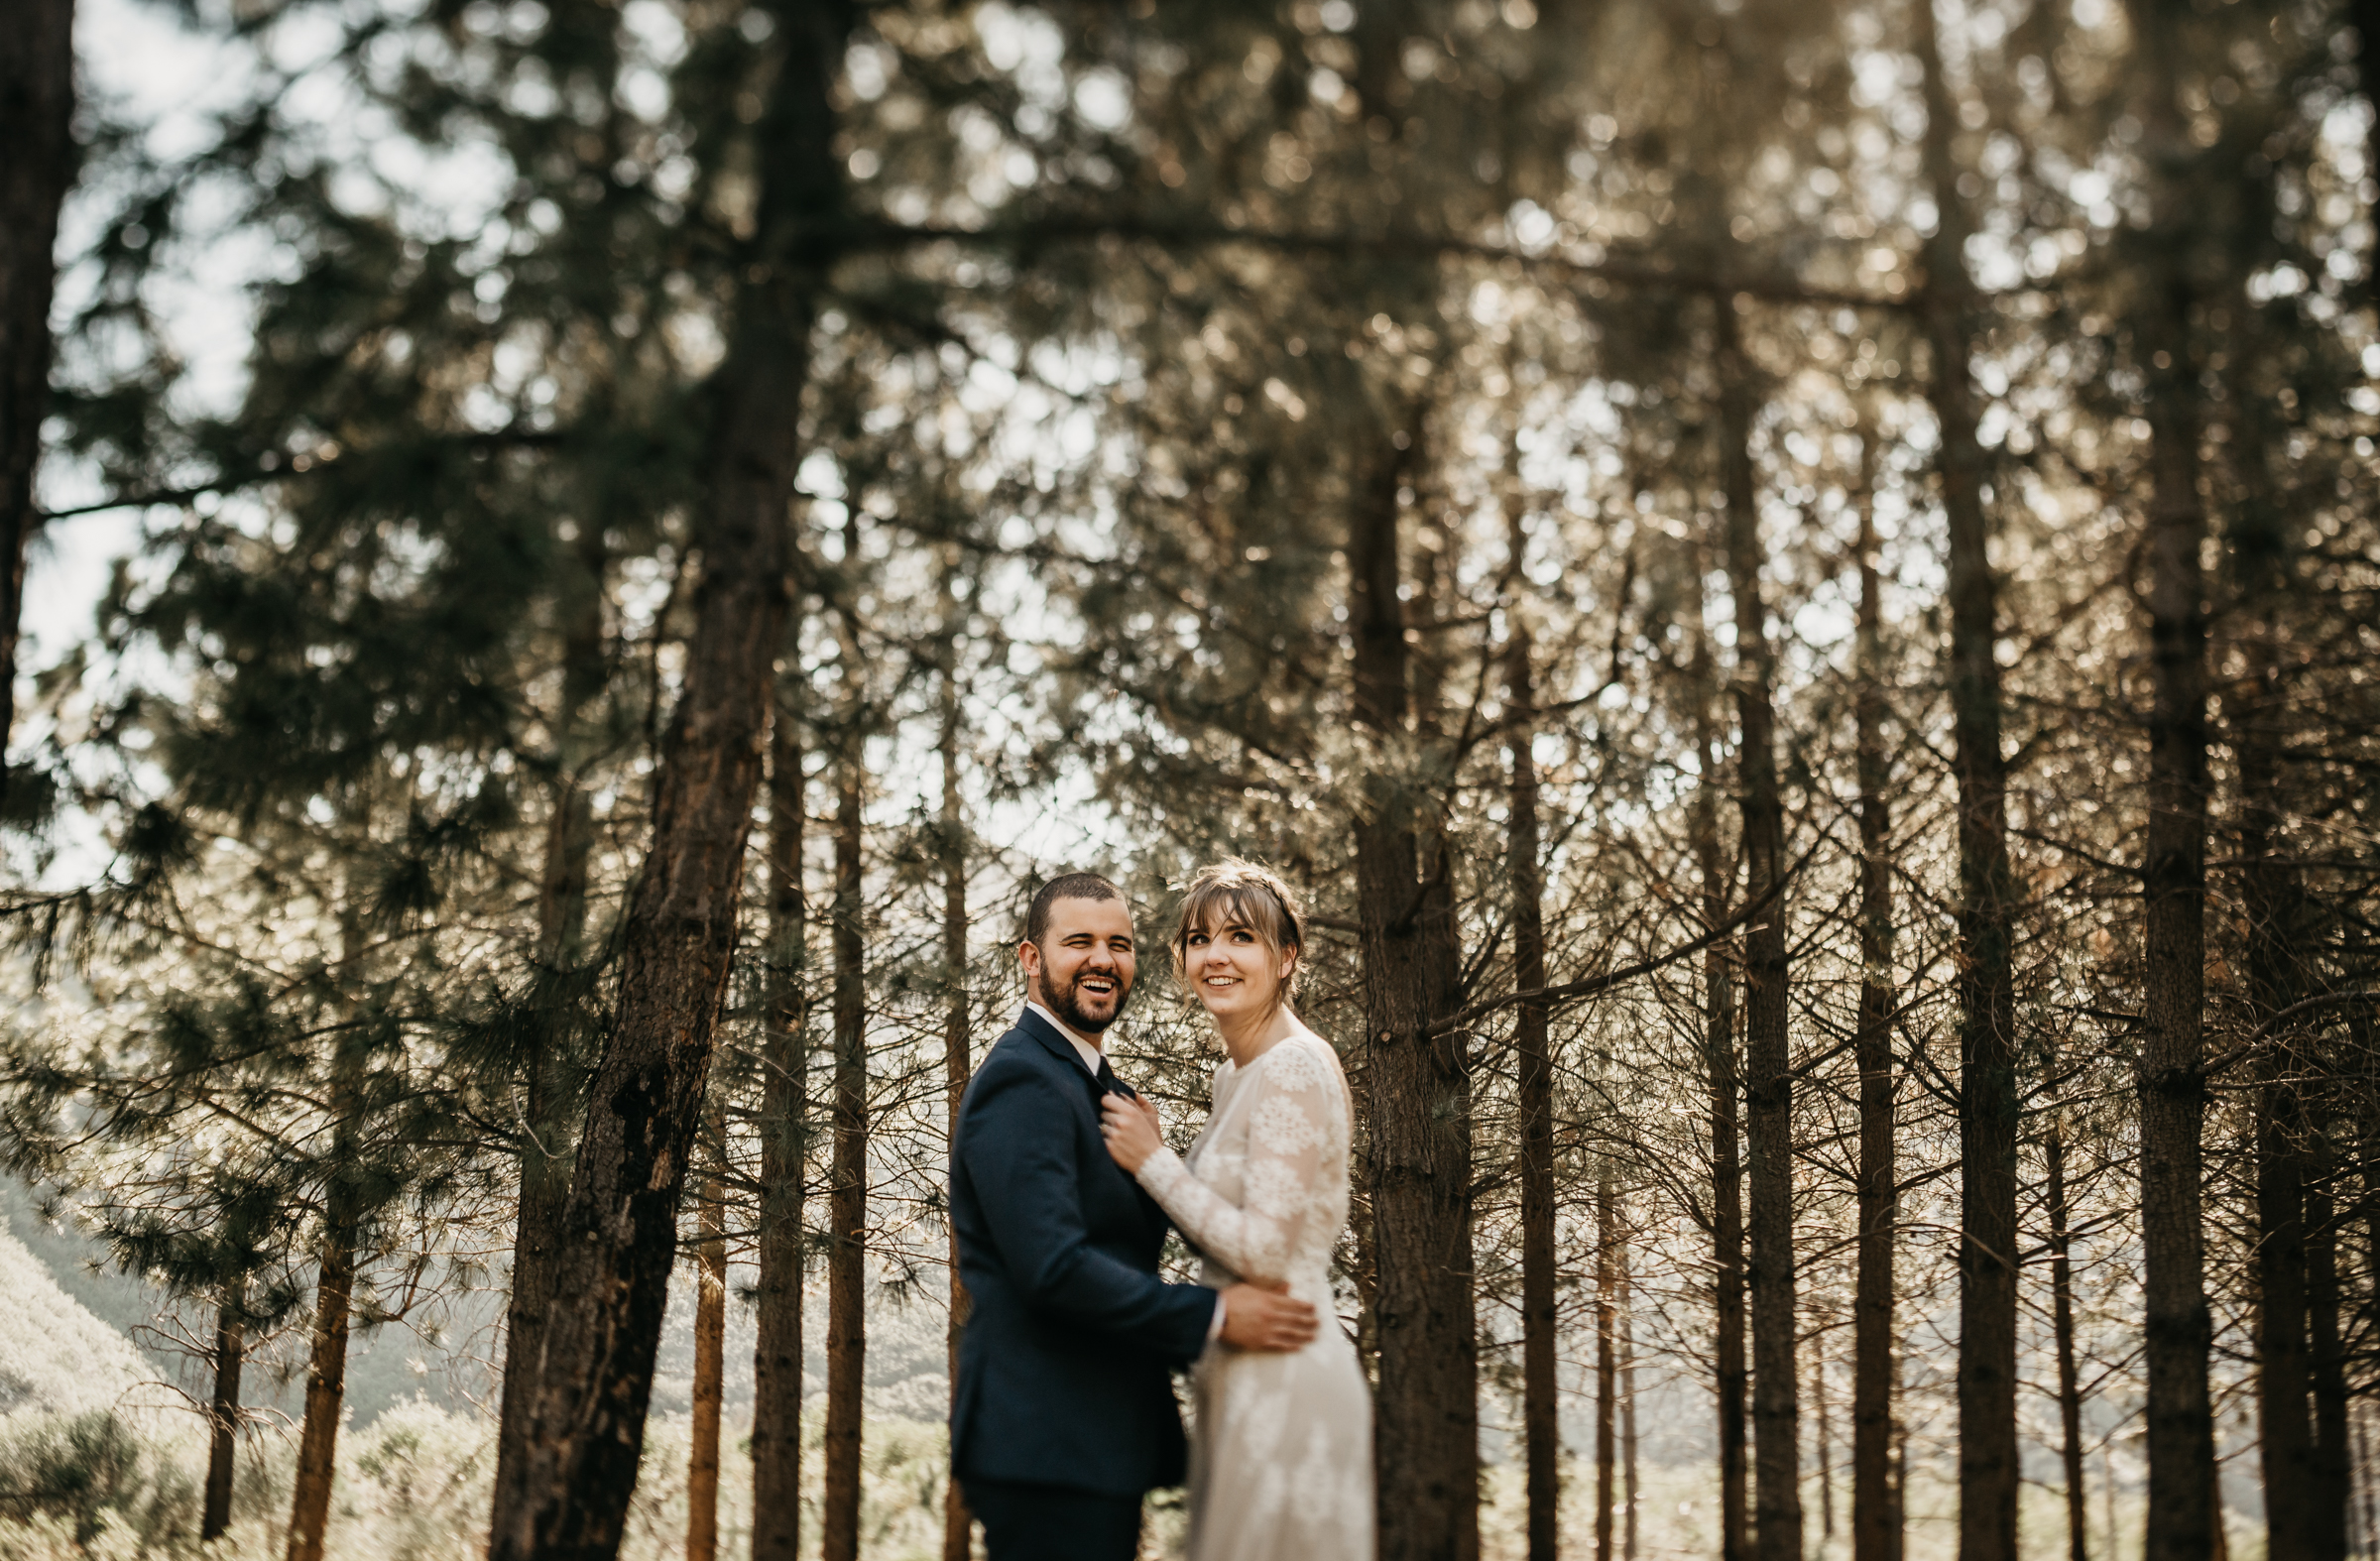 ©Isaiah + Taylor Photography - Los Angeles Wedding Photographers - Los Angeles Forest Wedding -12.jpg